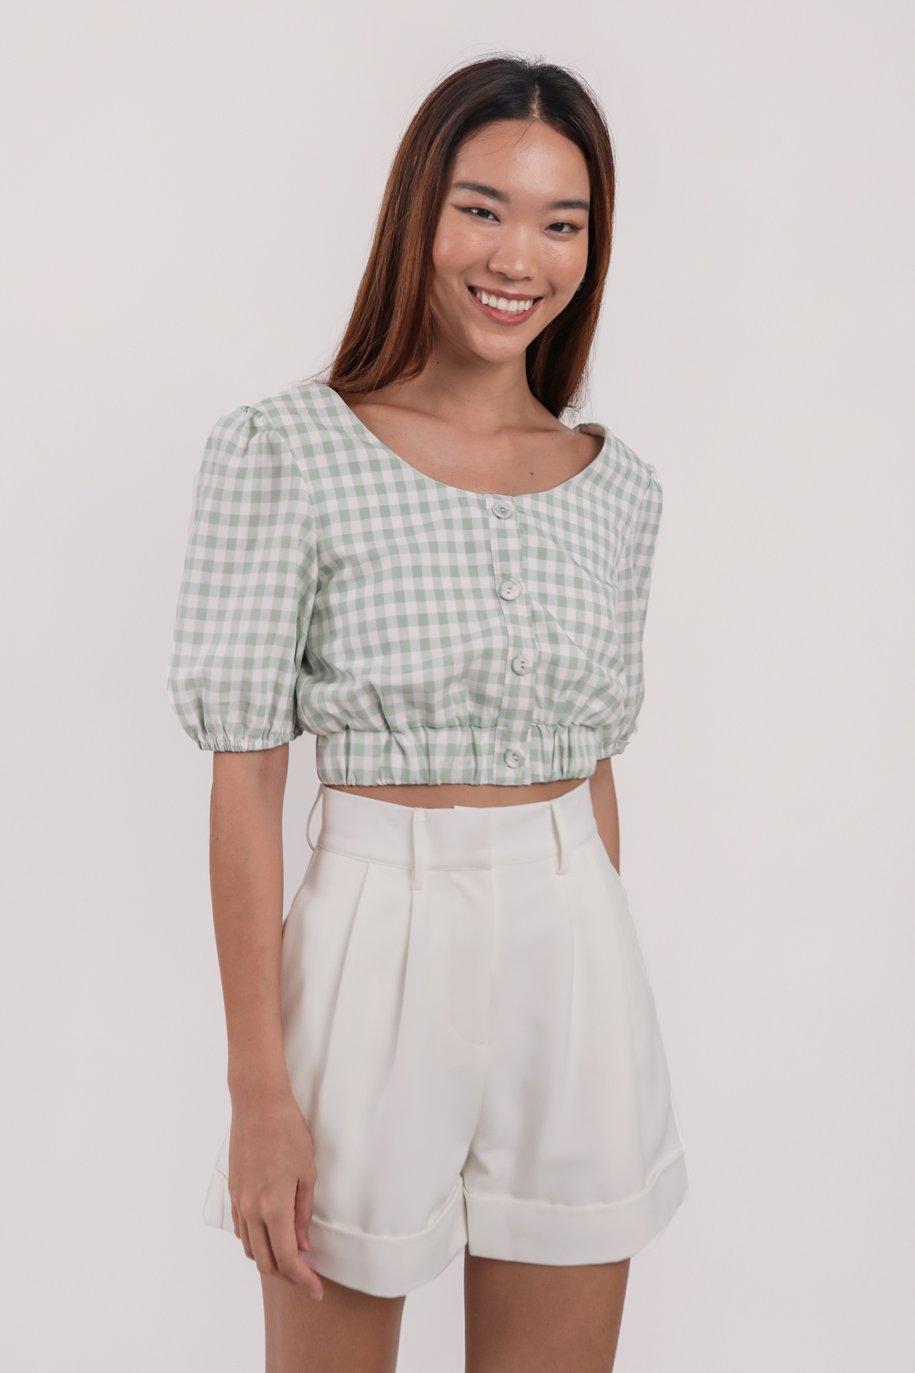 Monica Puffy Sleeve Top (Green Gingham)